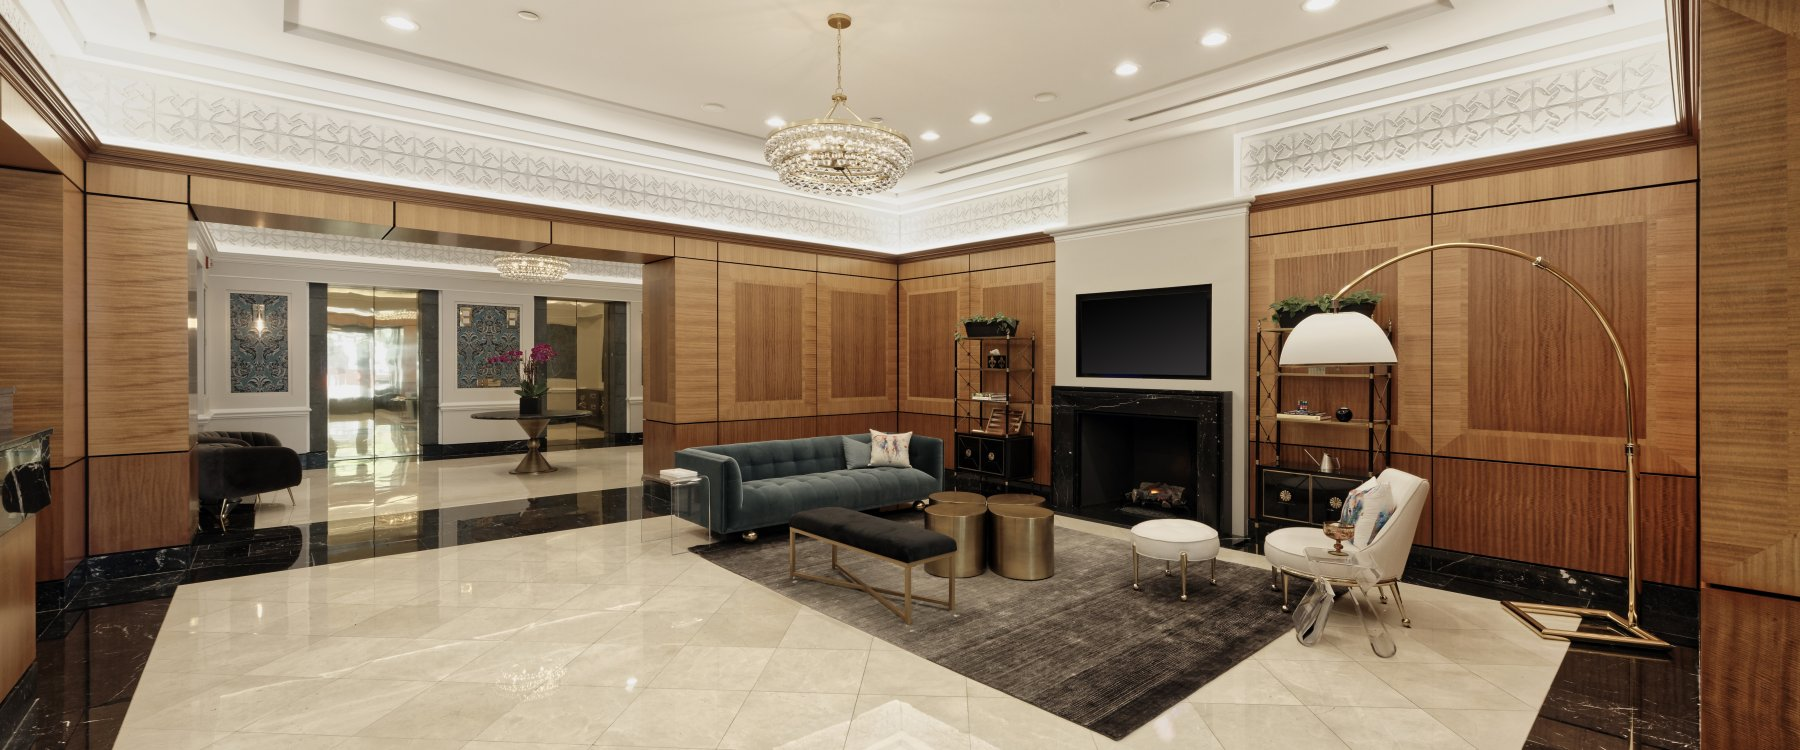 2401 Lobby